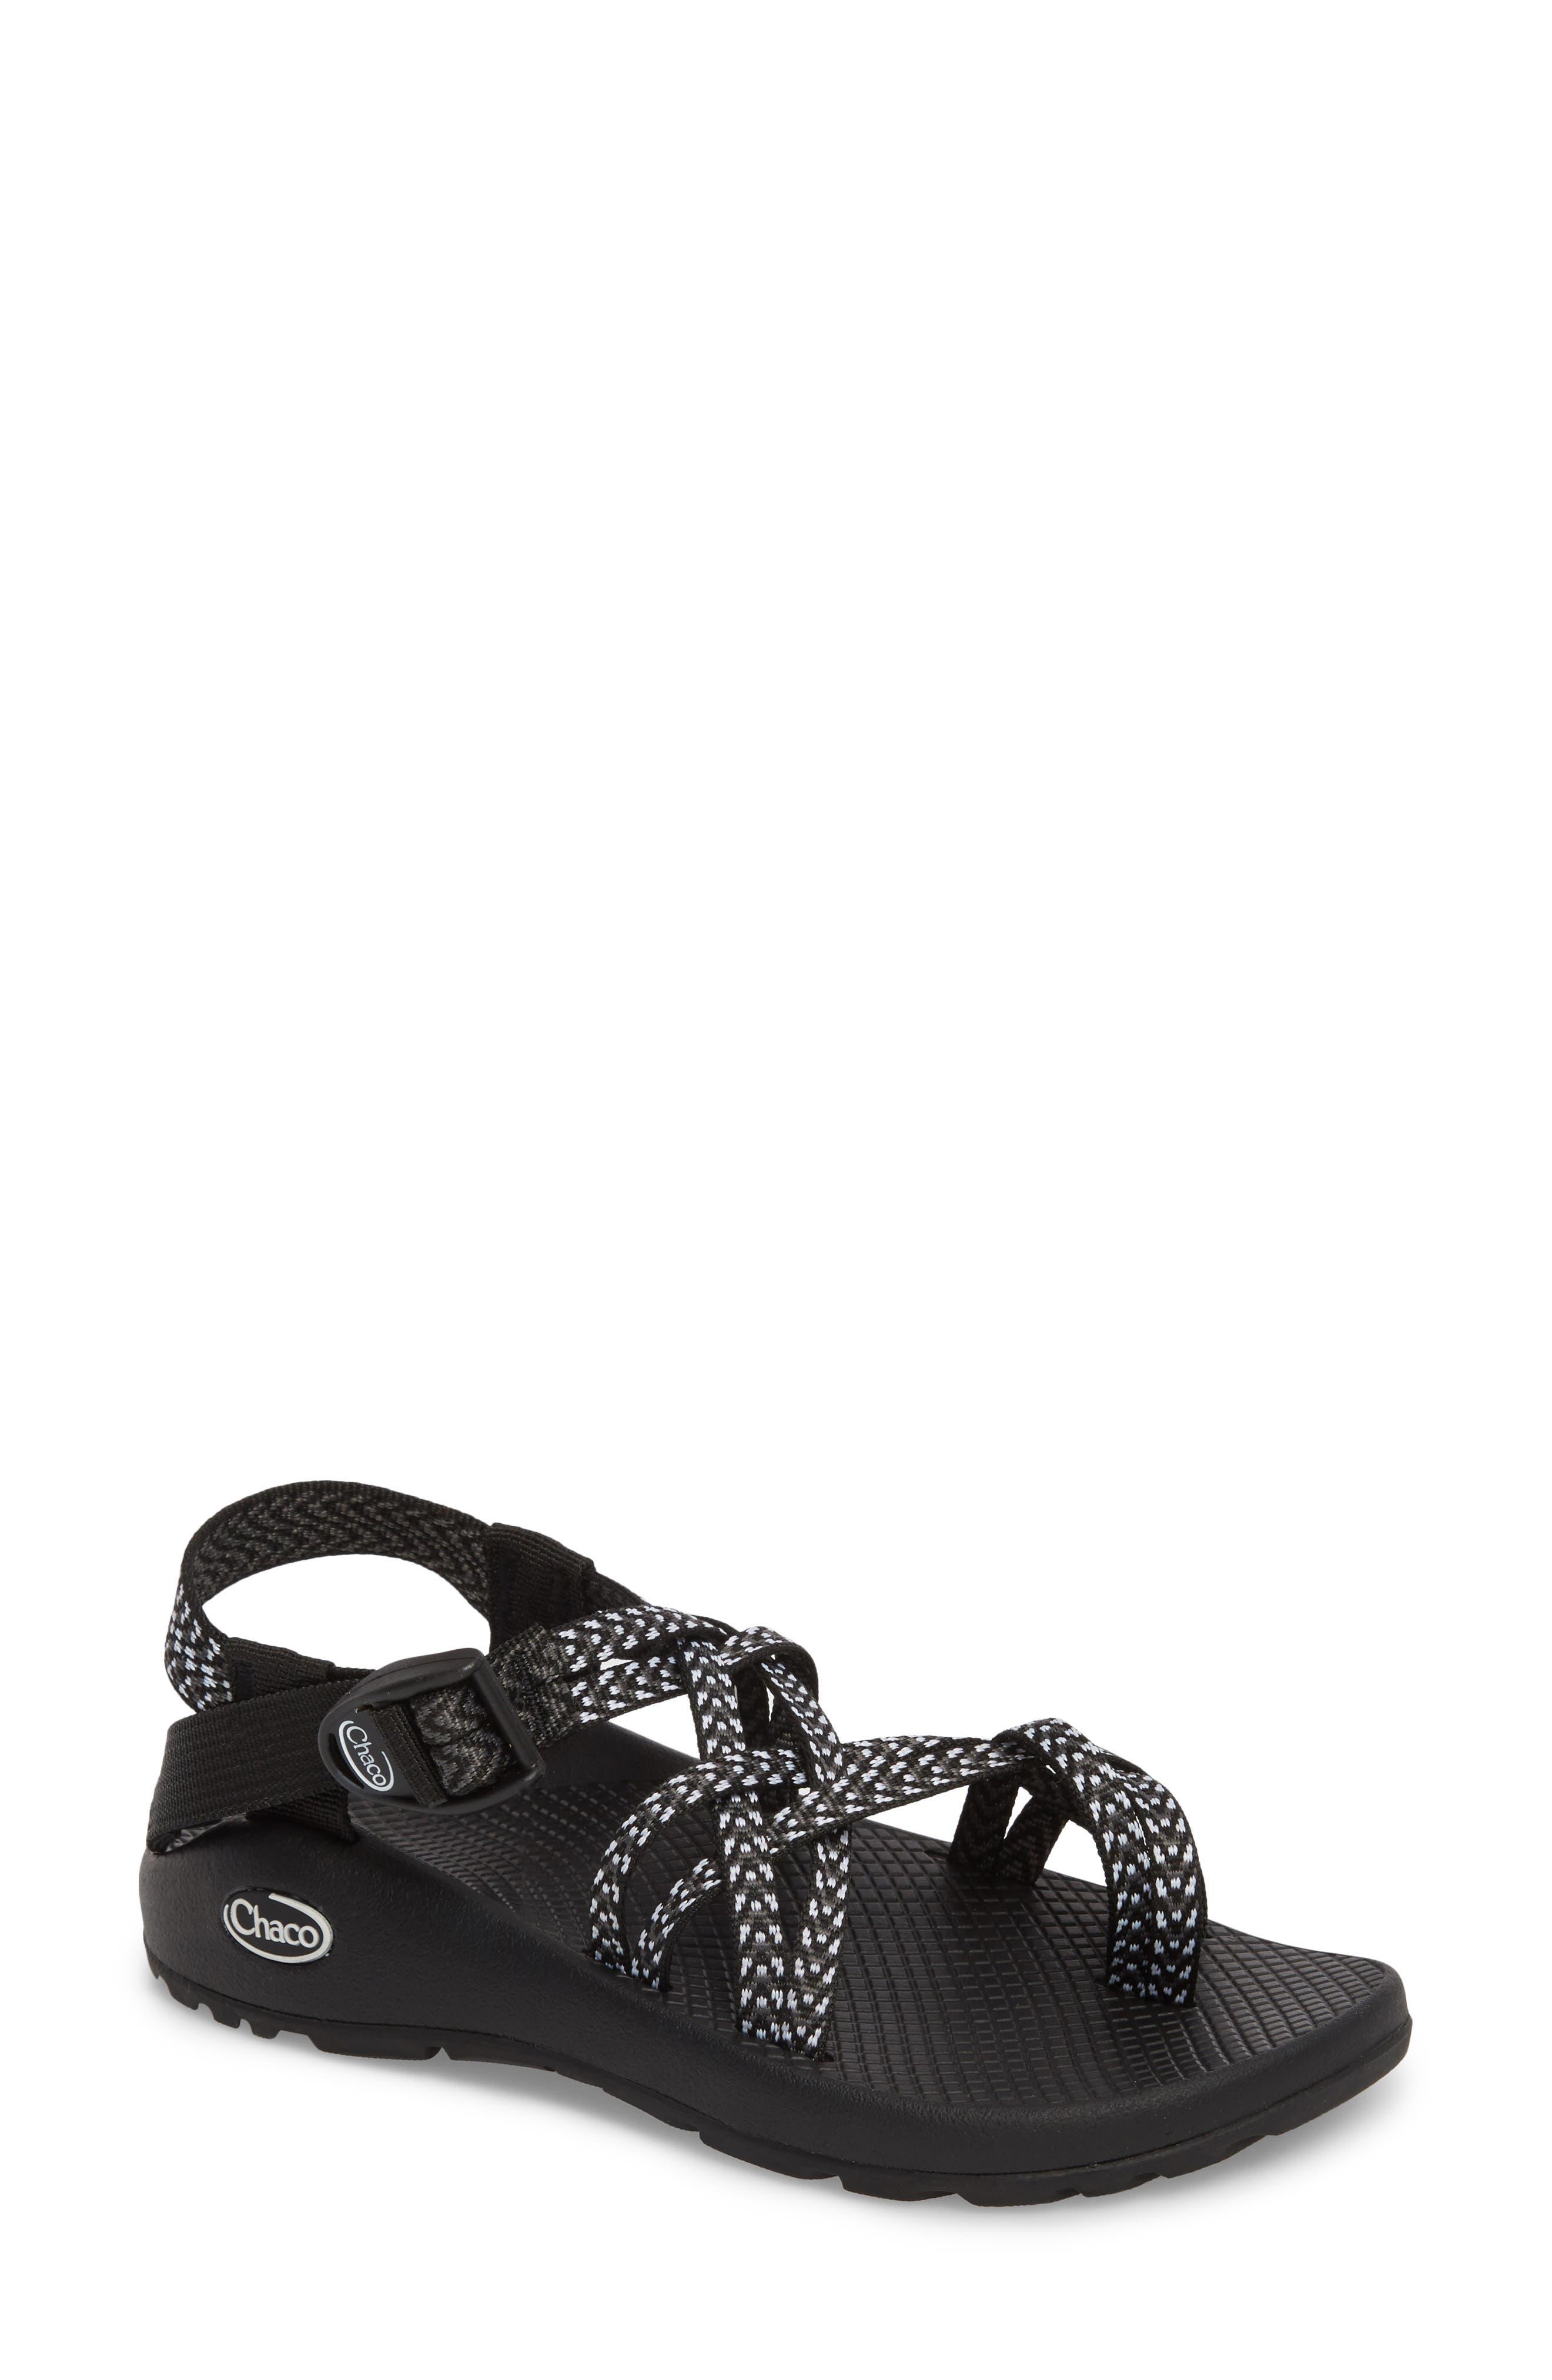 Main Image - Chaco ZX/2® Classic Sandal (Women)